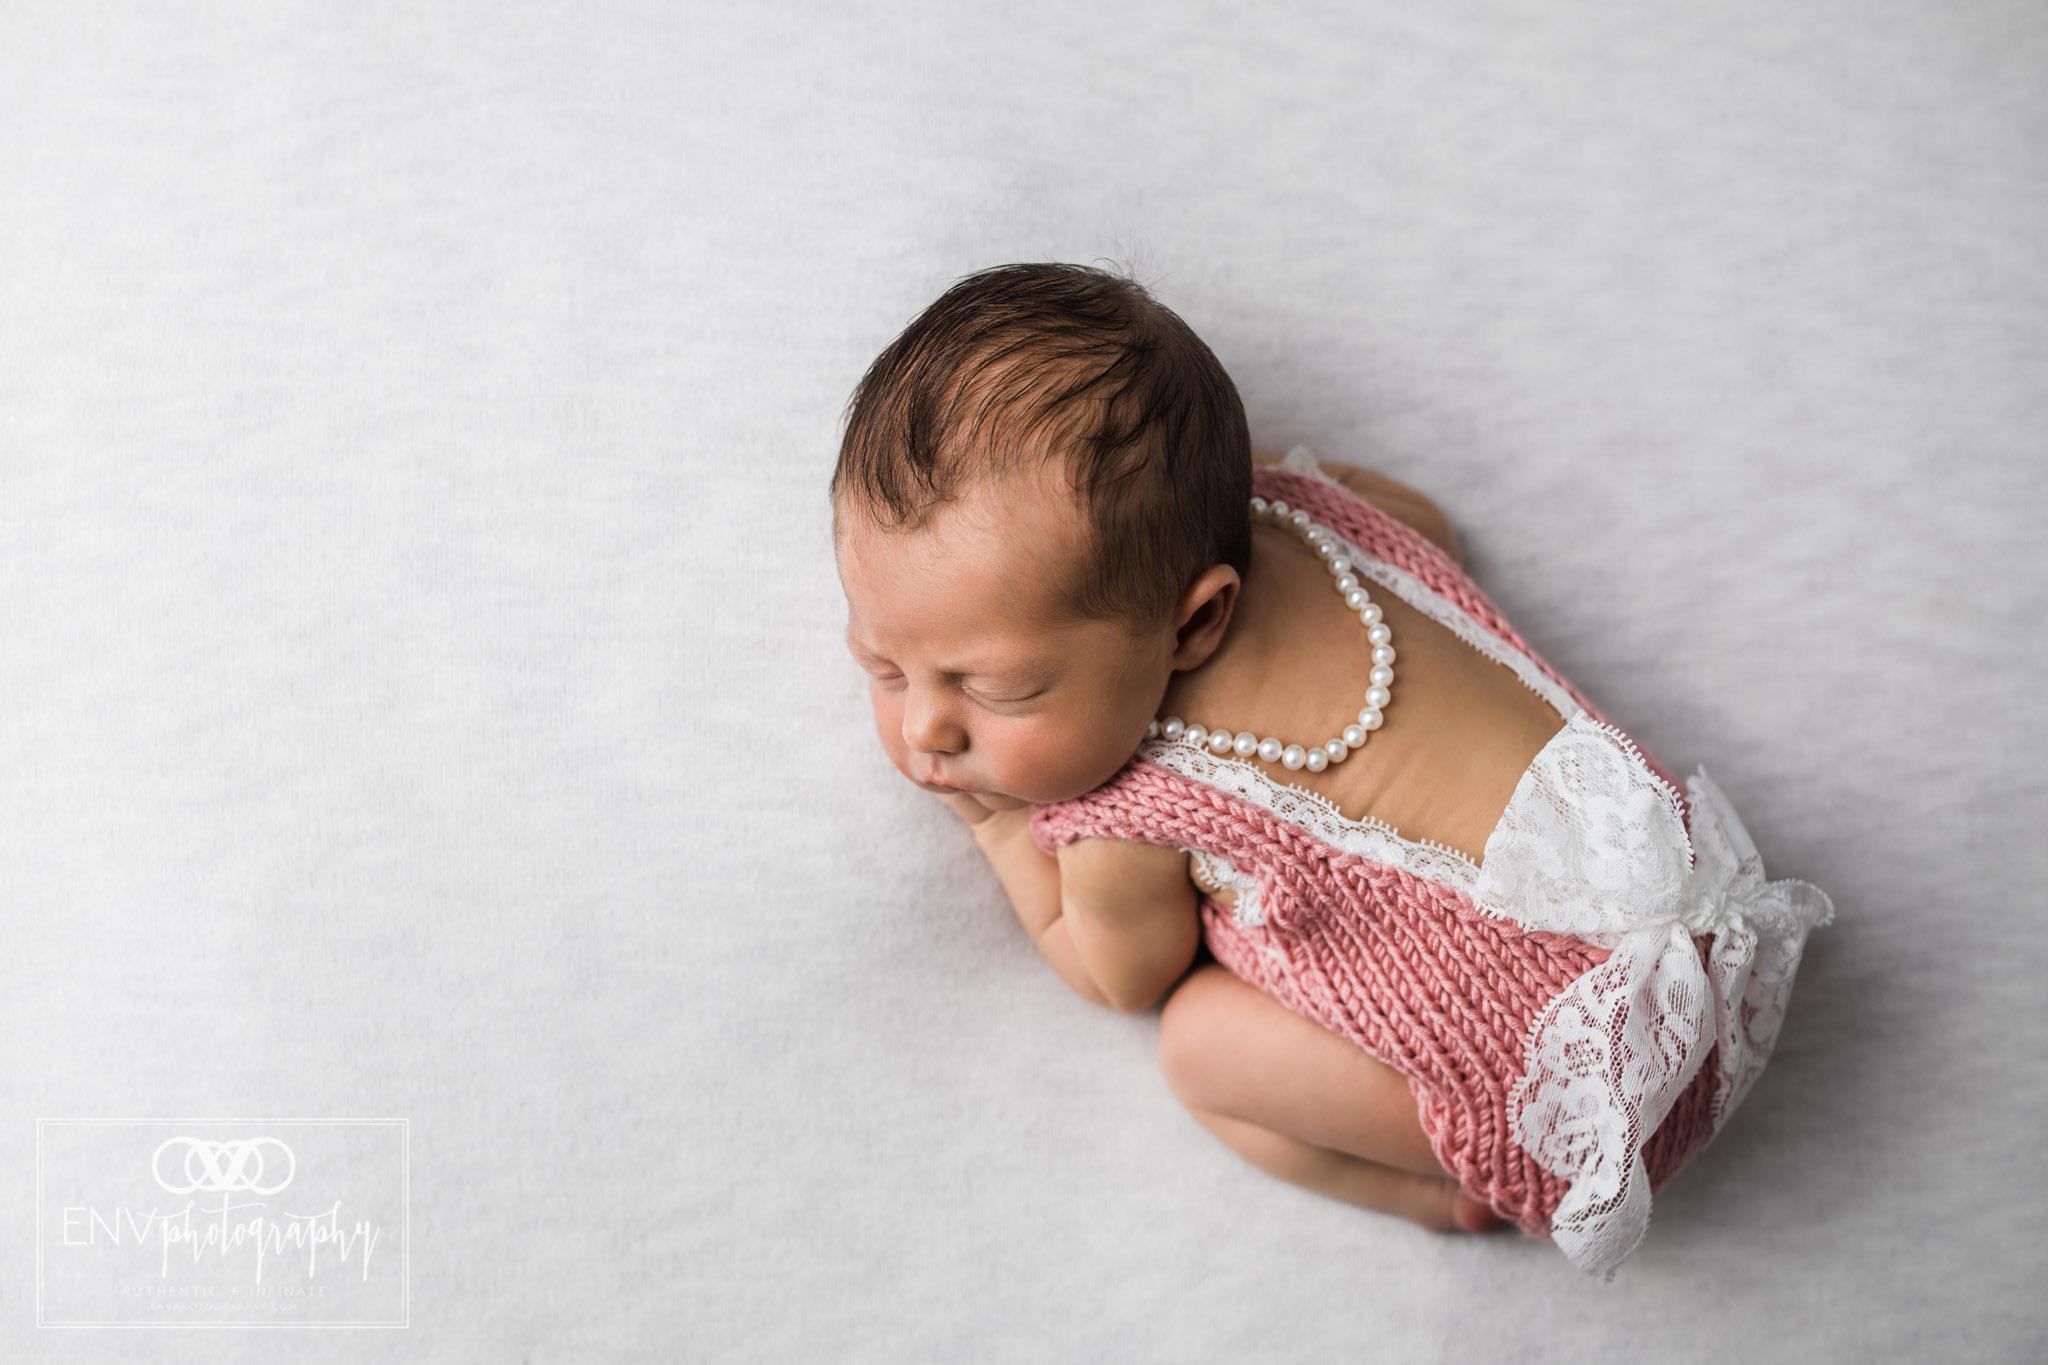 columbus ohio mount vernon ohio newborn photographer (5).jpg